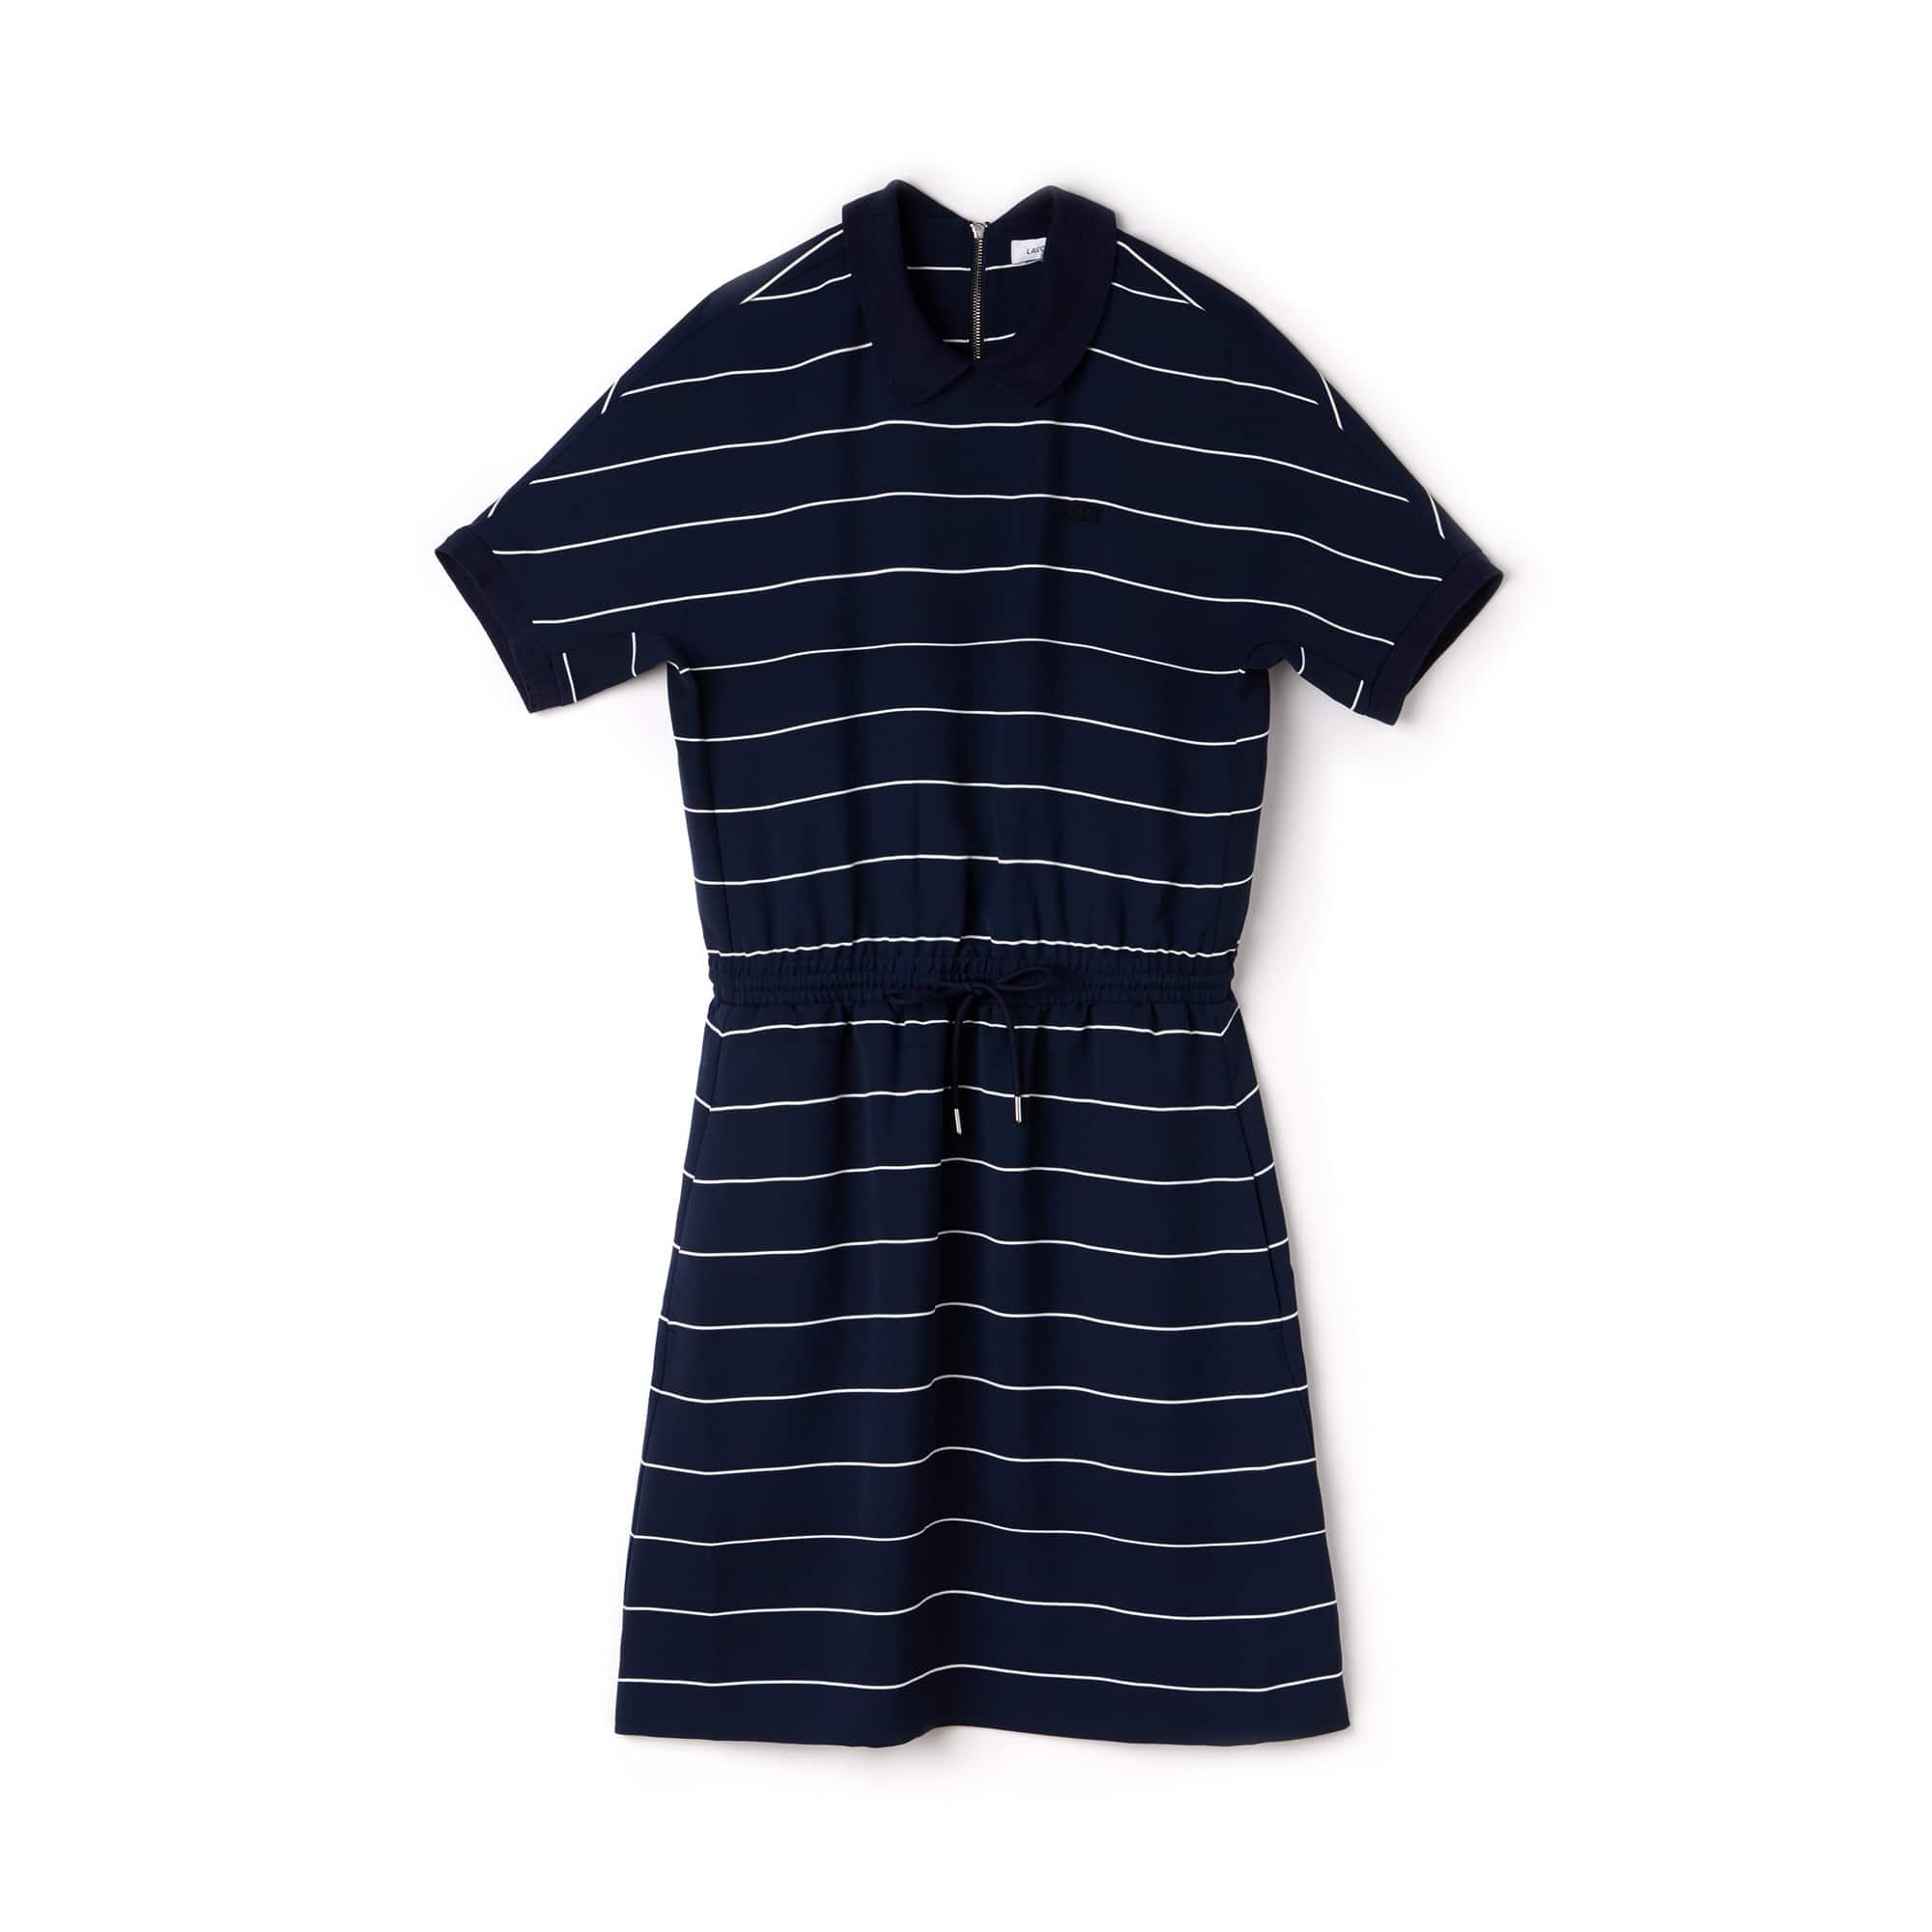 Women's Elasticized Waistband Knit Polo Dress